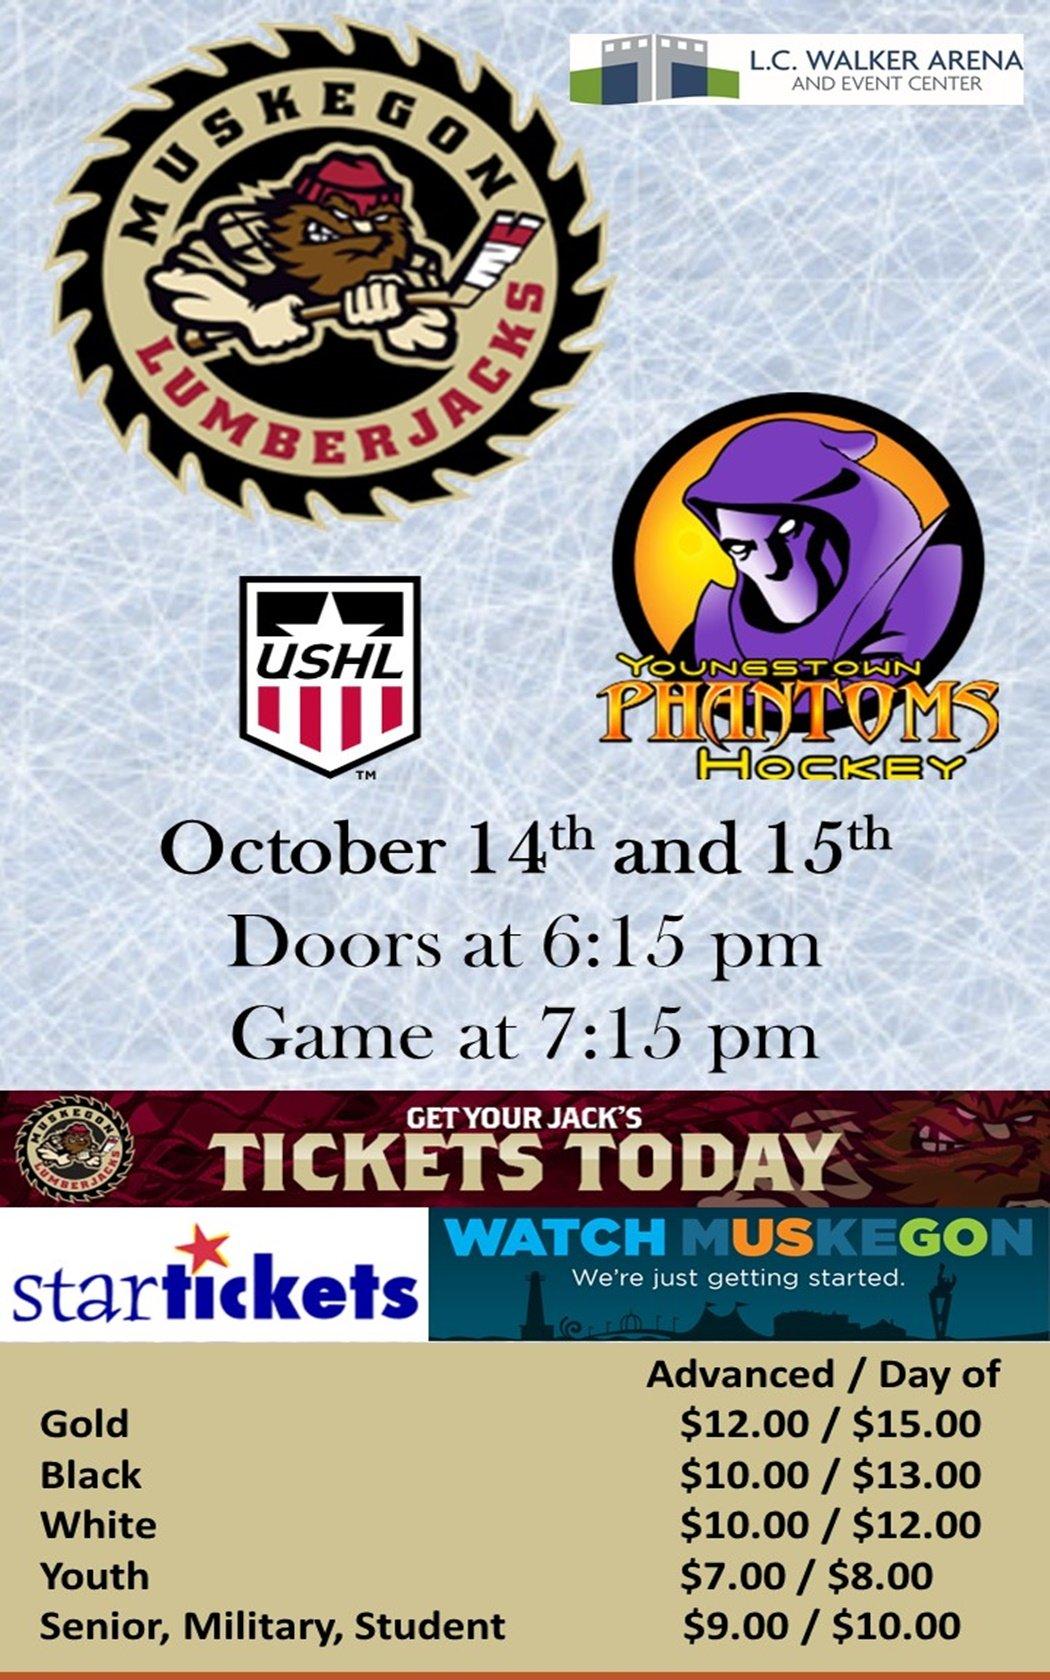 Oct 14,15 – Muskegon Lumberjacks vs Youngstown Phantoms